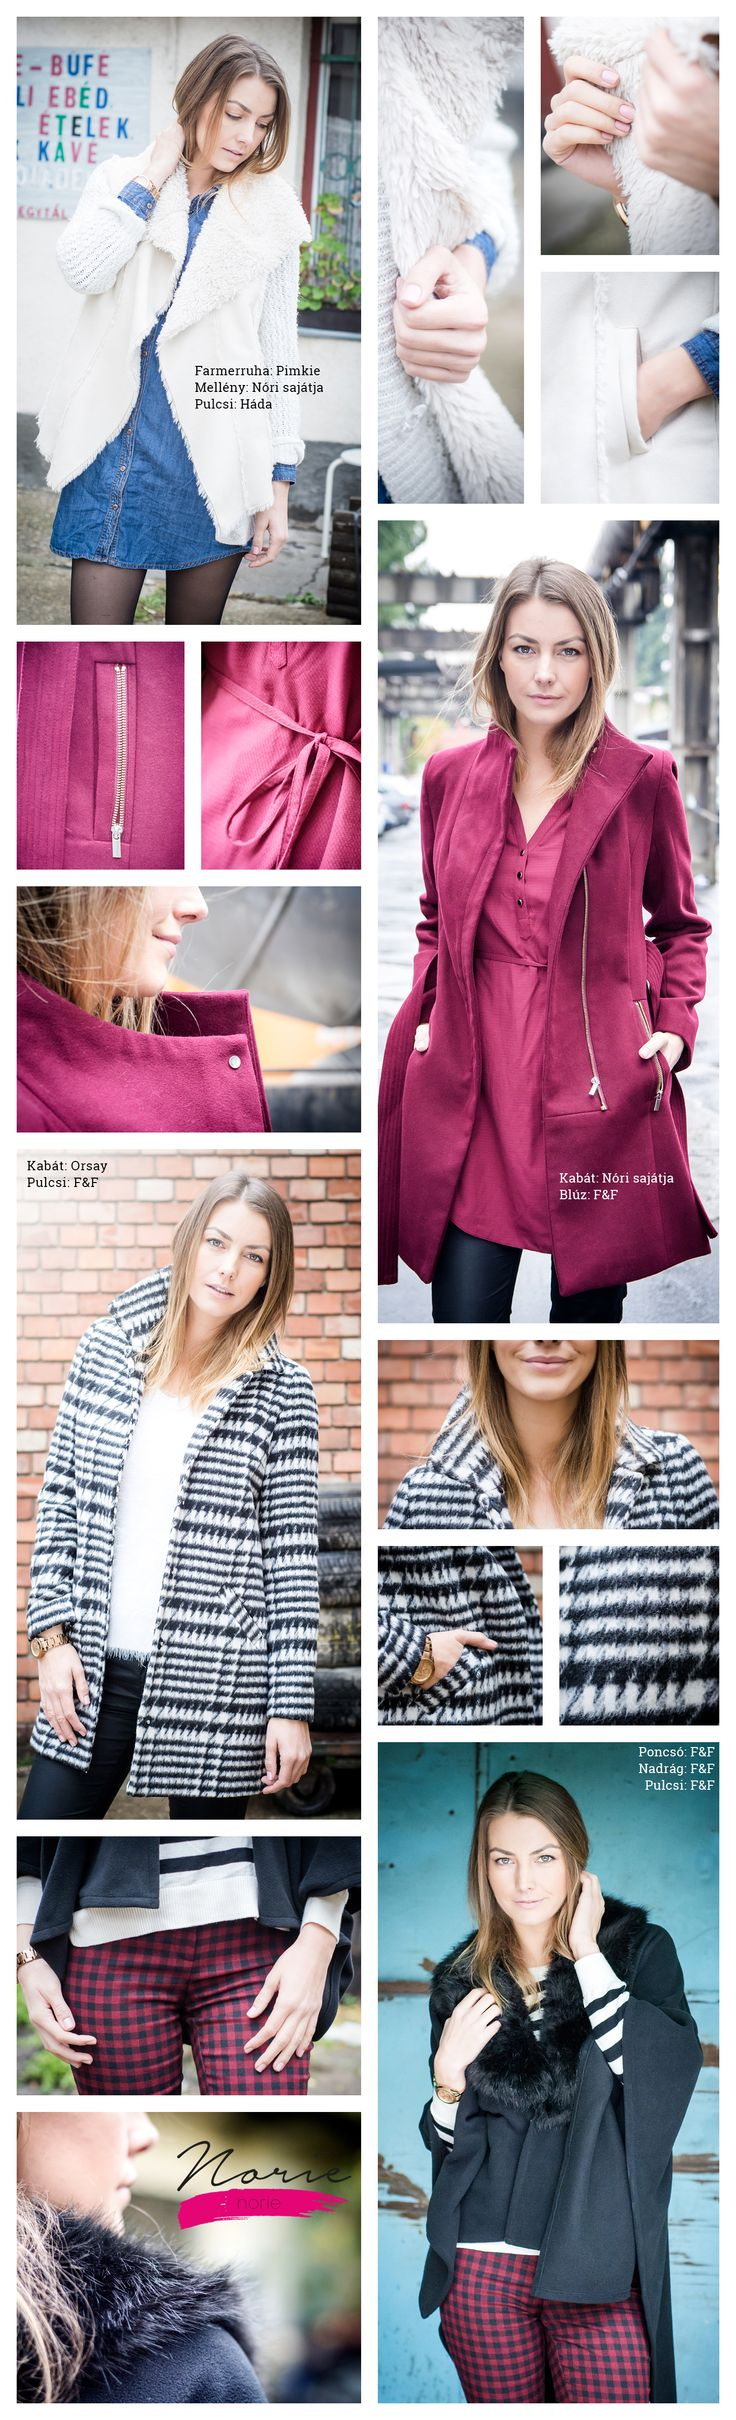 NORIE-blog -Takács Nóra- Fall inspiration- fashion